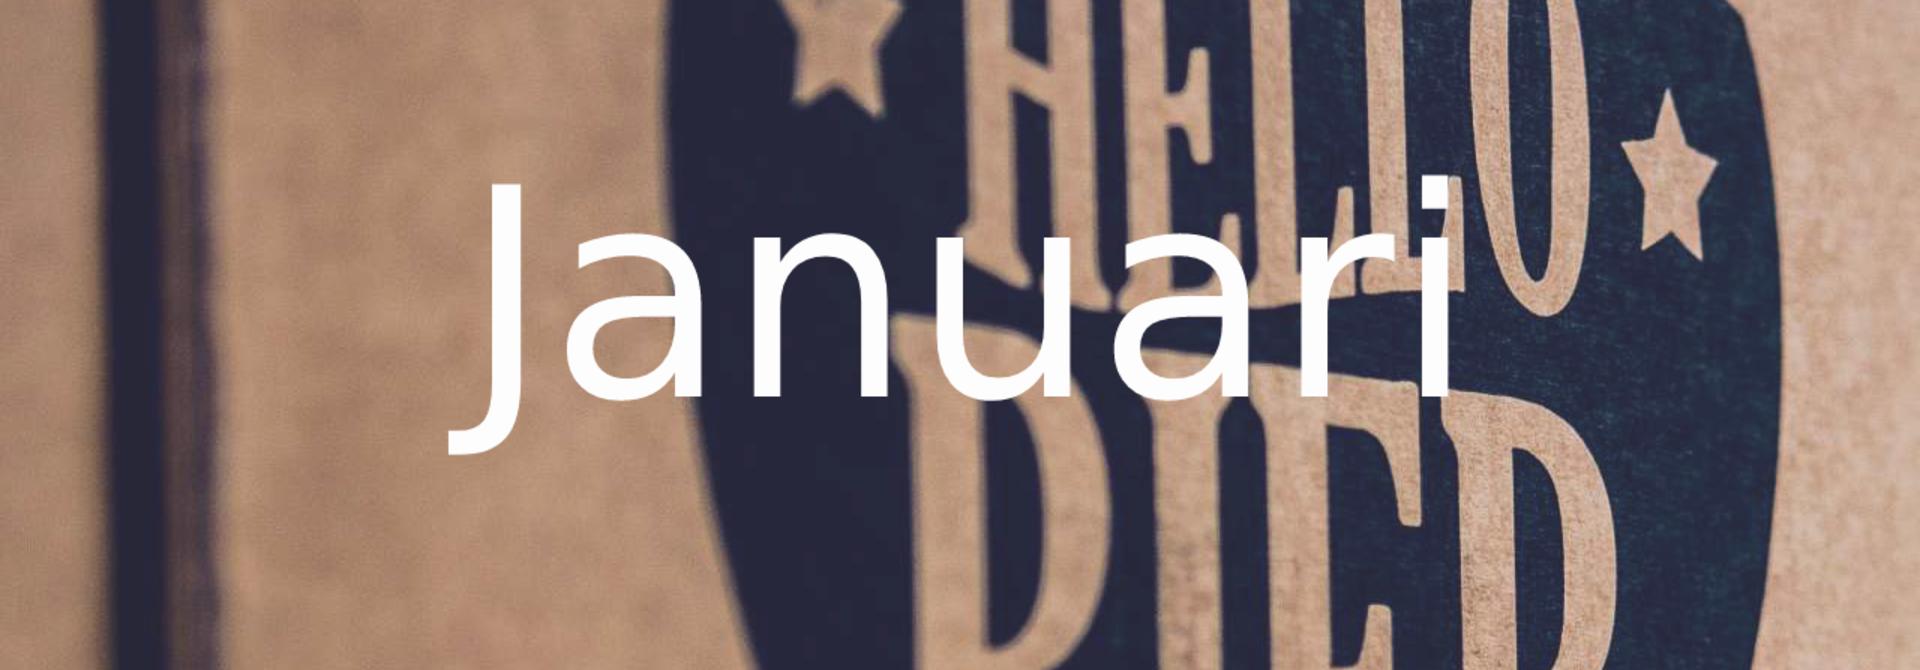 Speciaalbier – bierpakket januari 2018